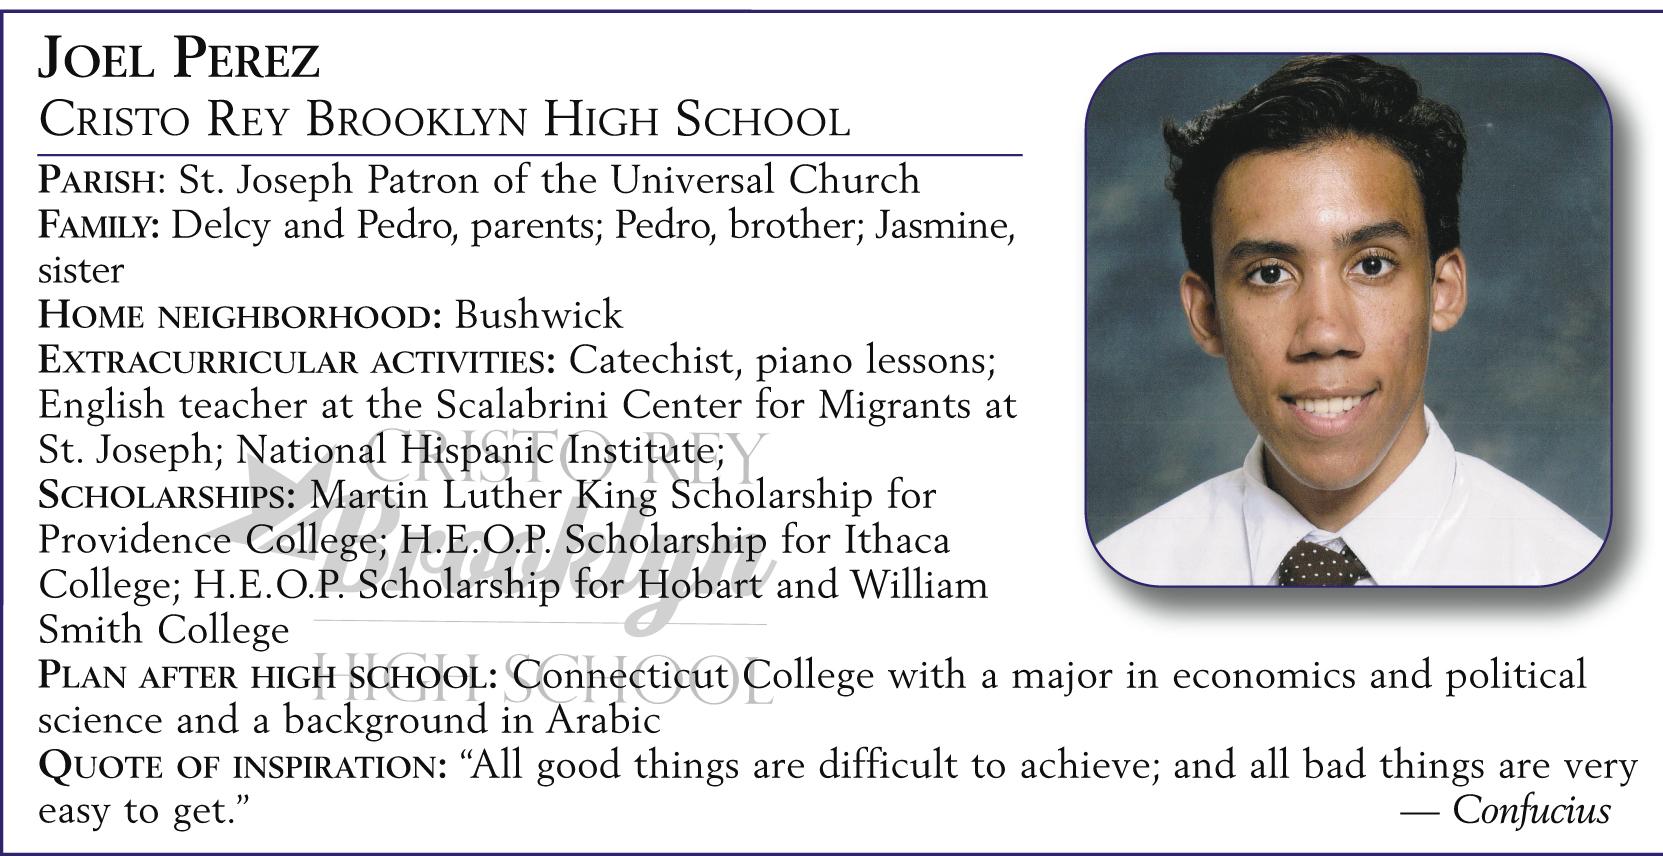 Joel Perez, Cristo Rey Brooklyn High School